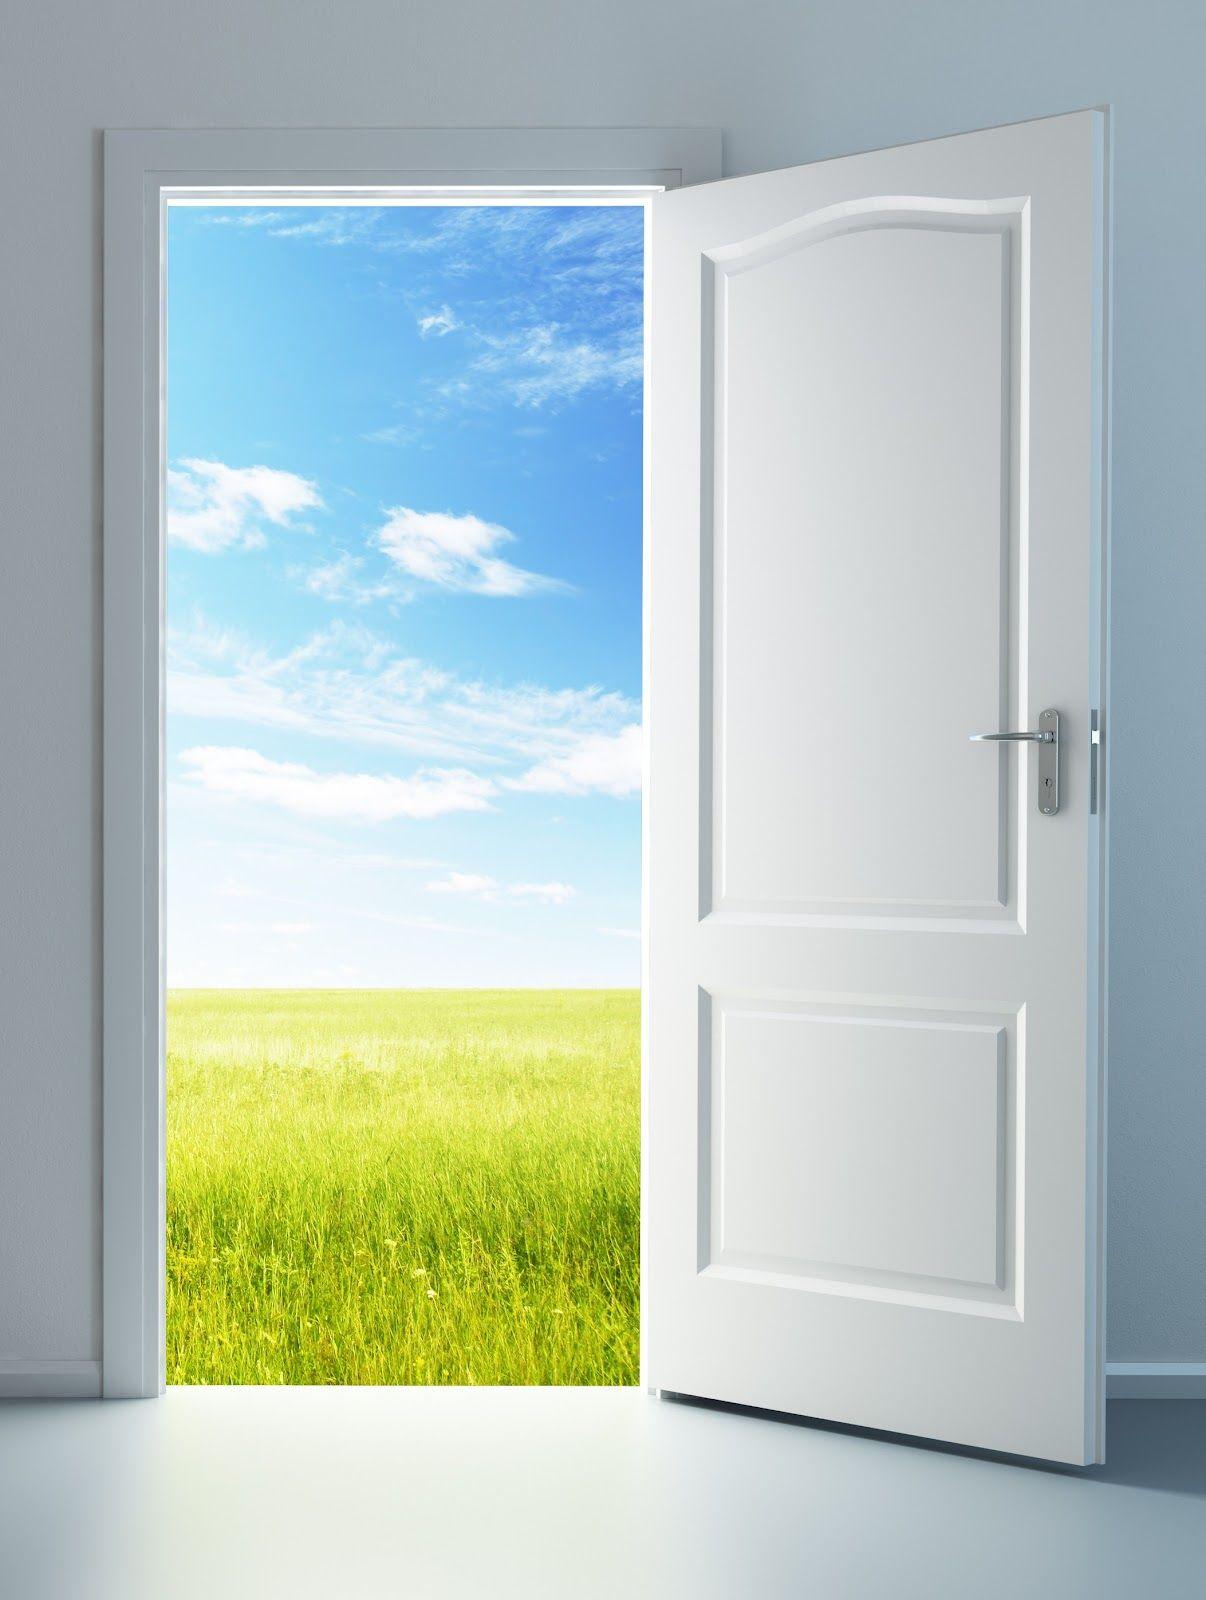 Картинки дверь открыта